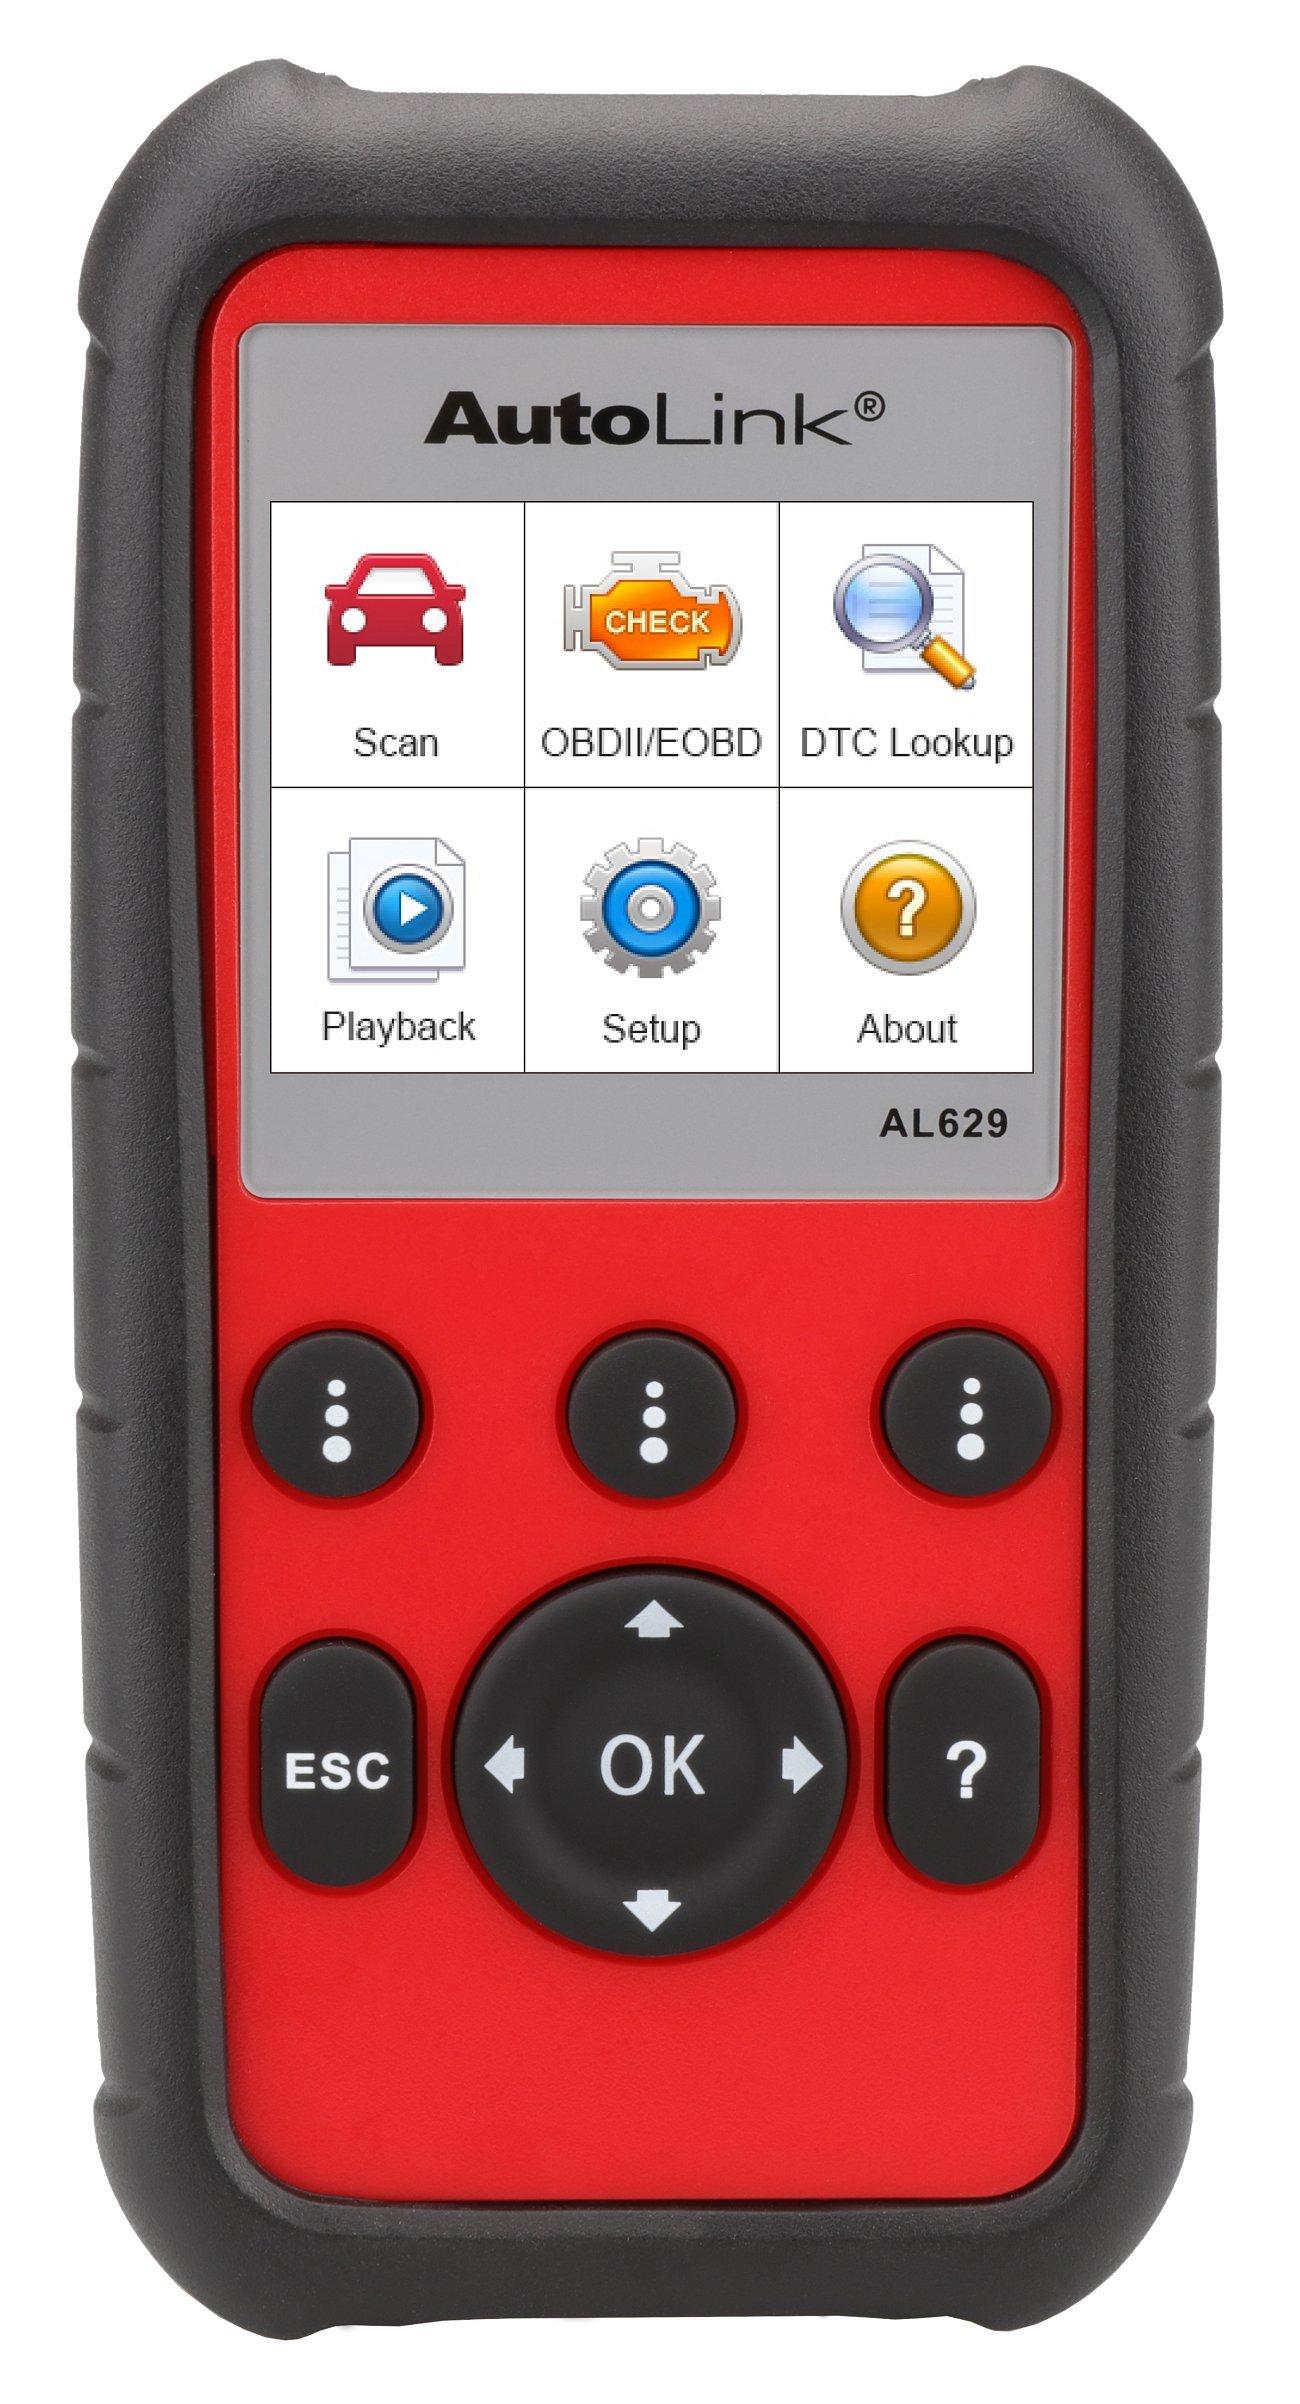 Autel Code Reader AutoLink AL629 Automotive Diagnostic Scan Tool for ABS SRS Engine Transmission,CAN OBDII Scanner DIY Professional Tool